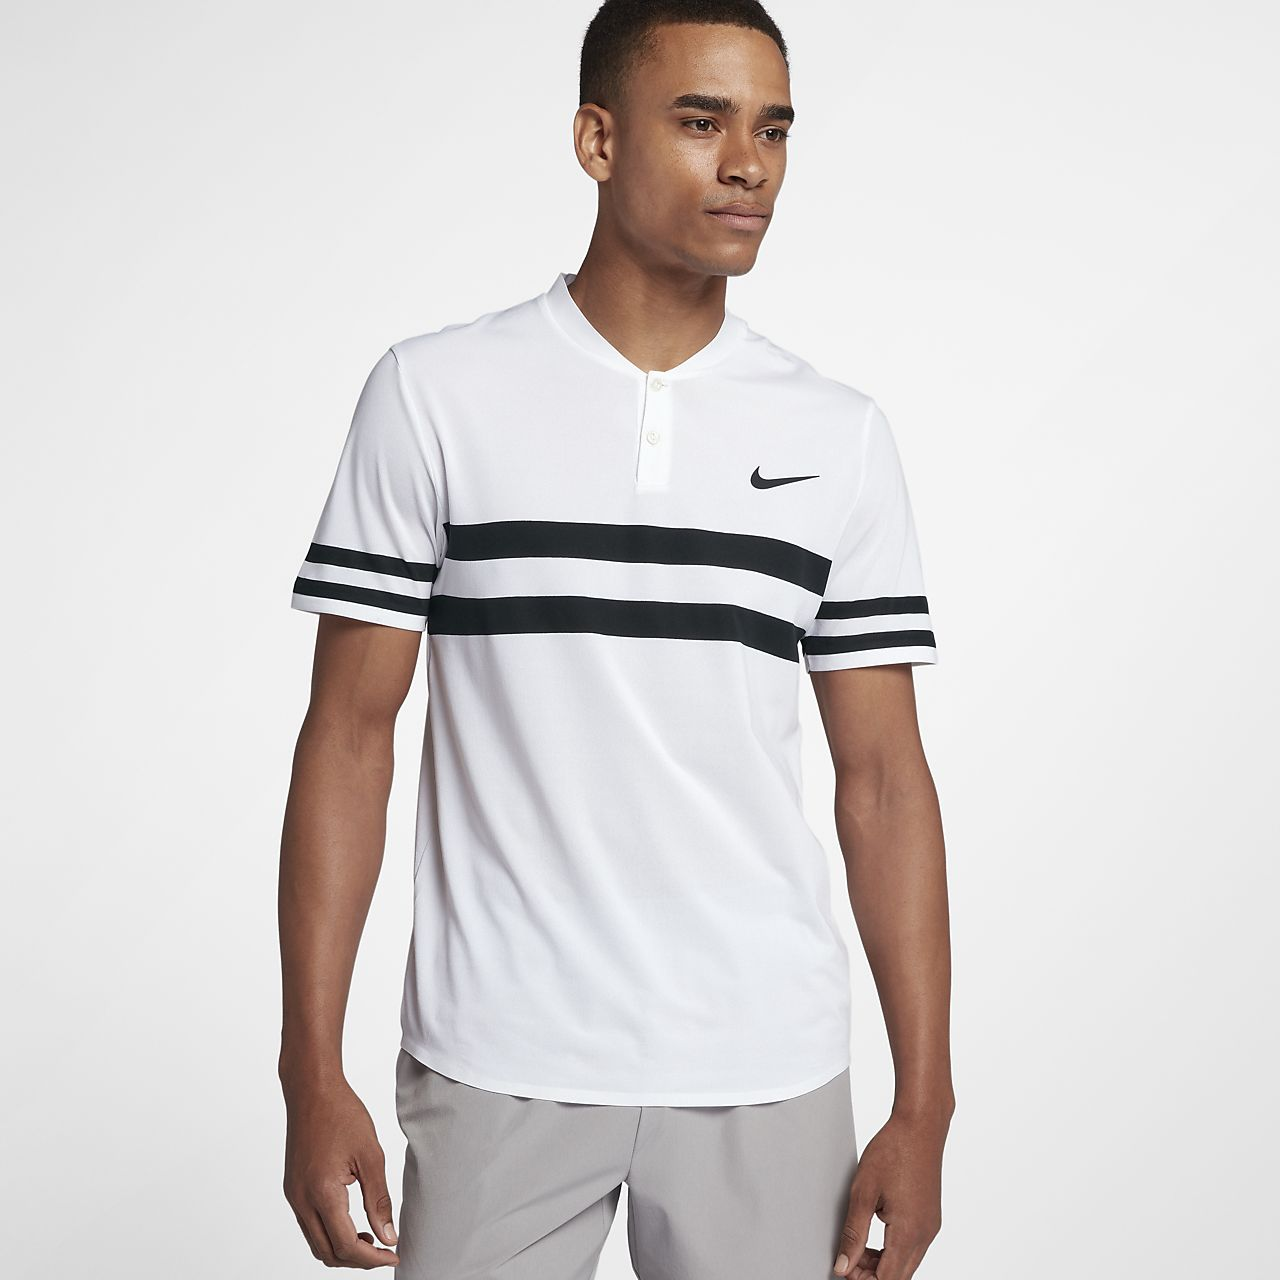 ... NikeCourt Dri-FIT Advantage Men's Tennis Polo